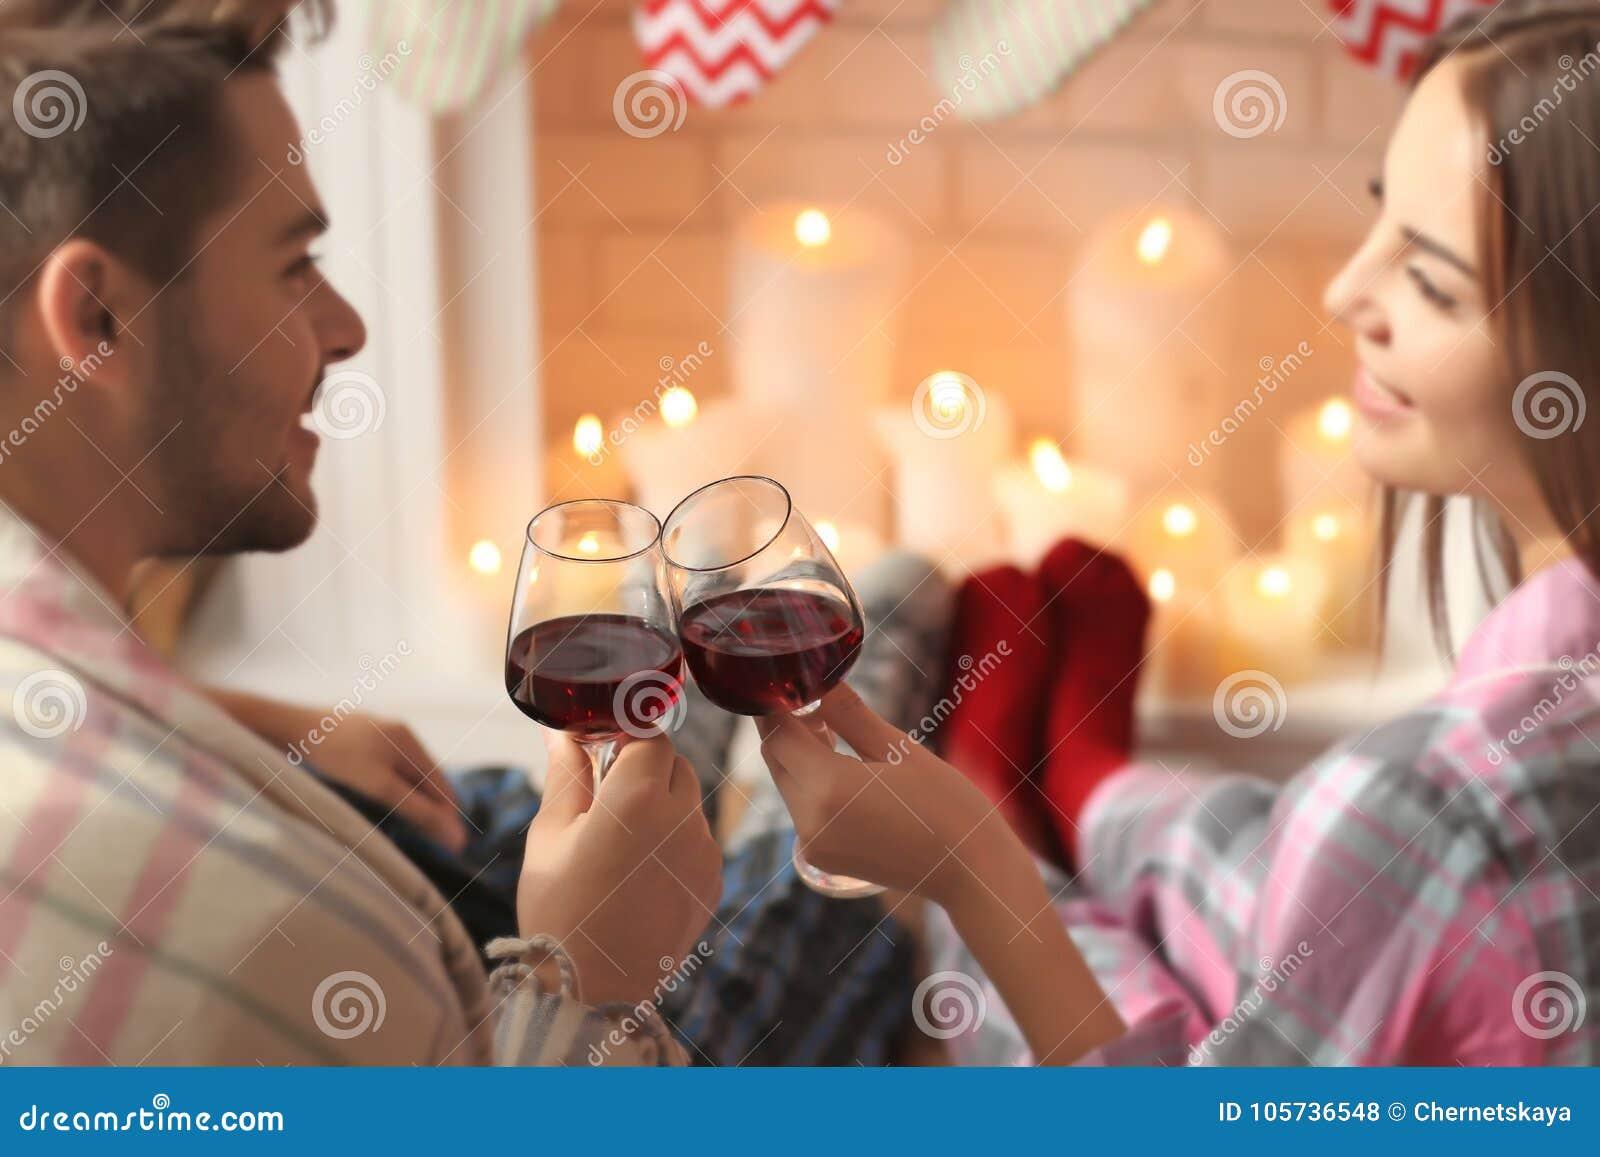 Вино пар выпивая перед камином дома